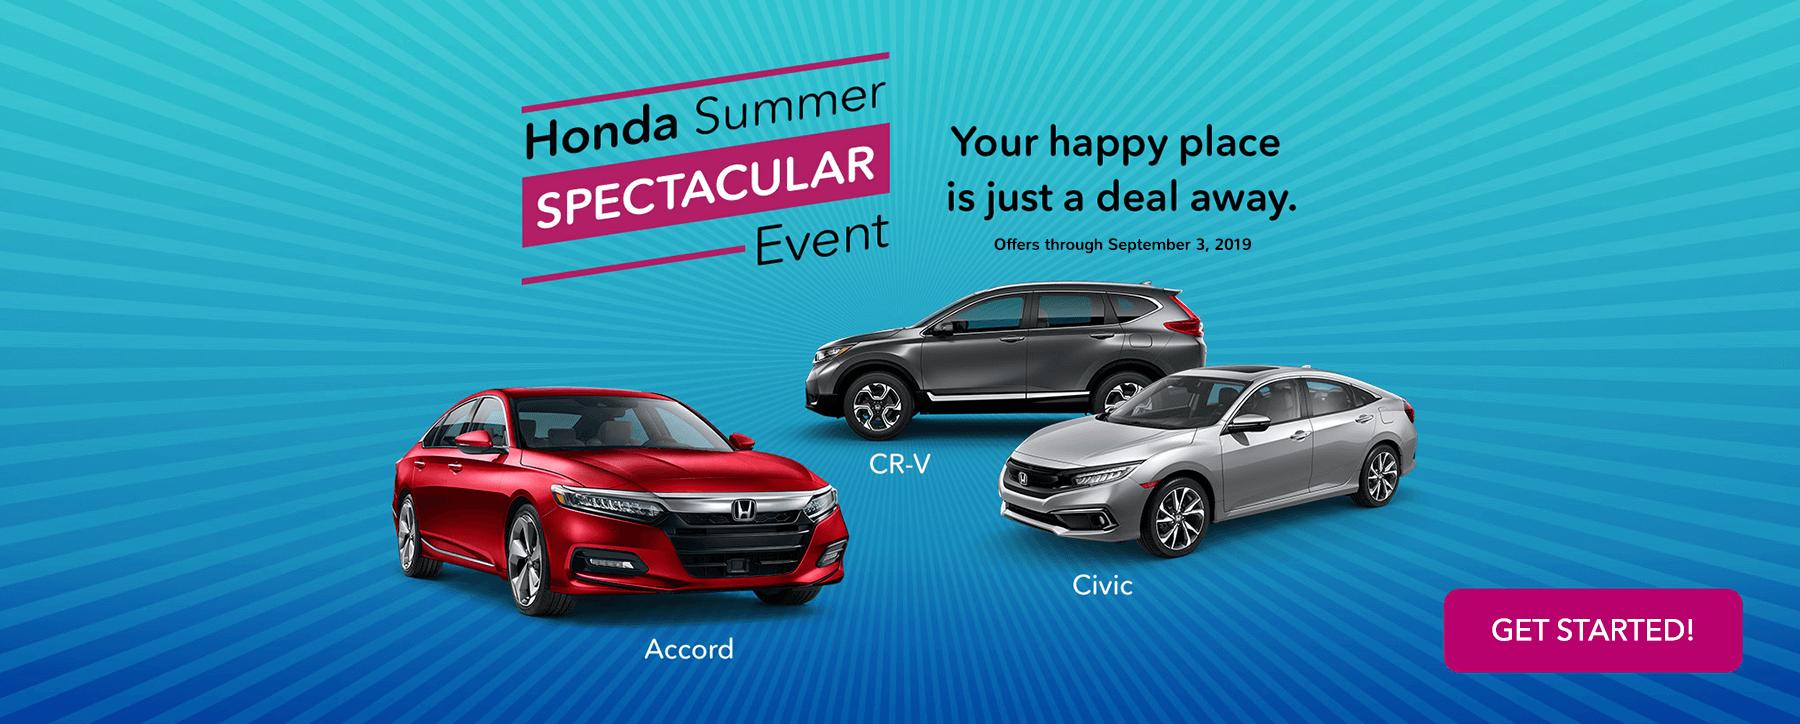 2019 Honda Summer Spectacular Event Banner